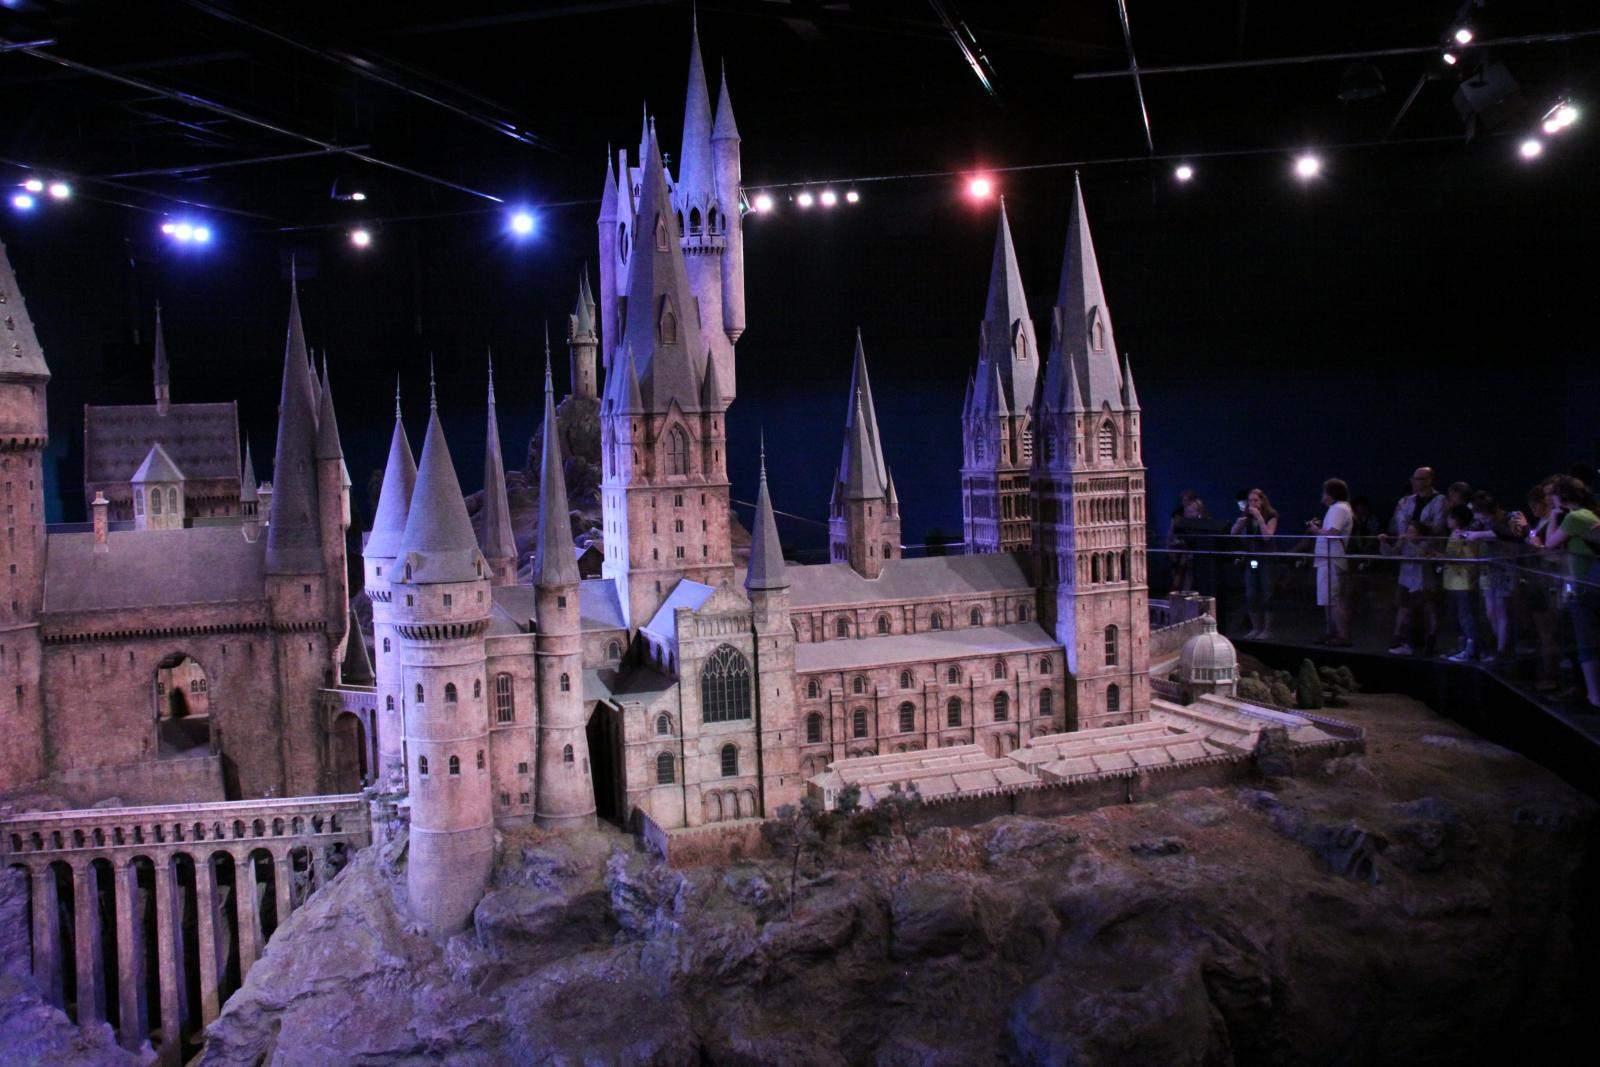 making harry potter8 The Making of Harry Potter, Warner Bros Studio London